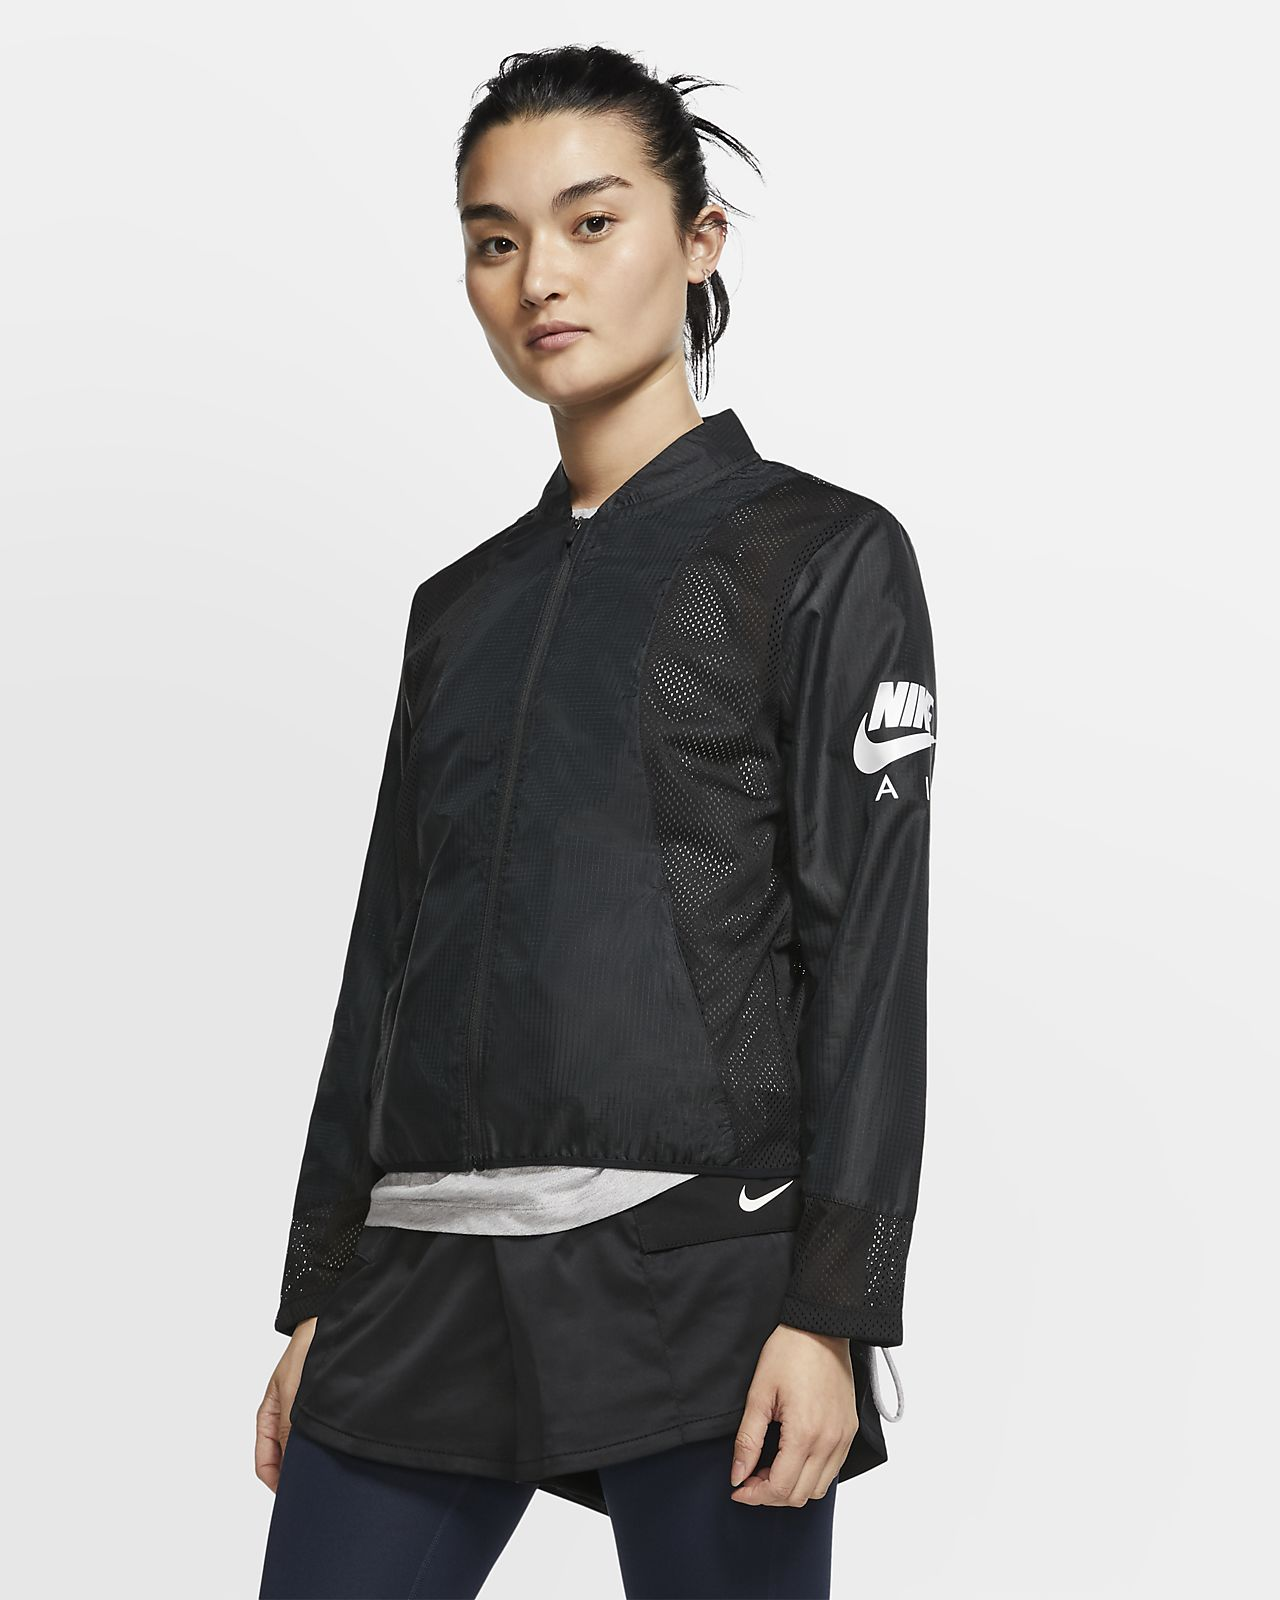 7ce6cb8f Low Resolution Nike løpejakke til dame Nike løpejakke til dame